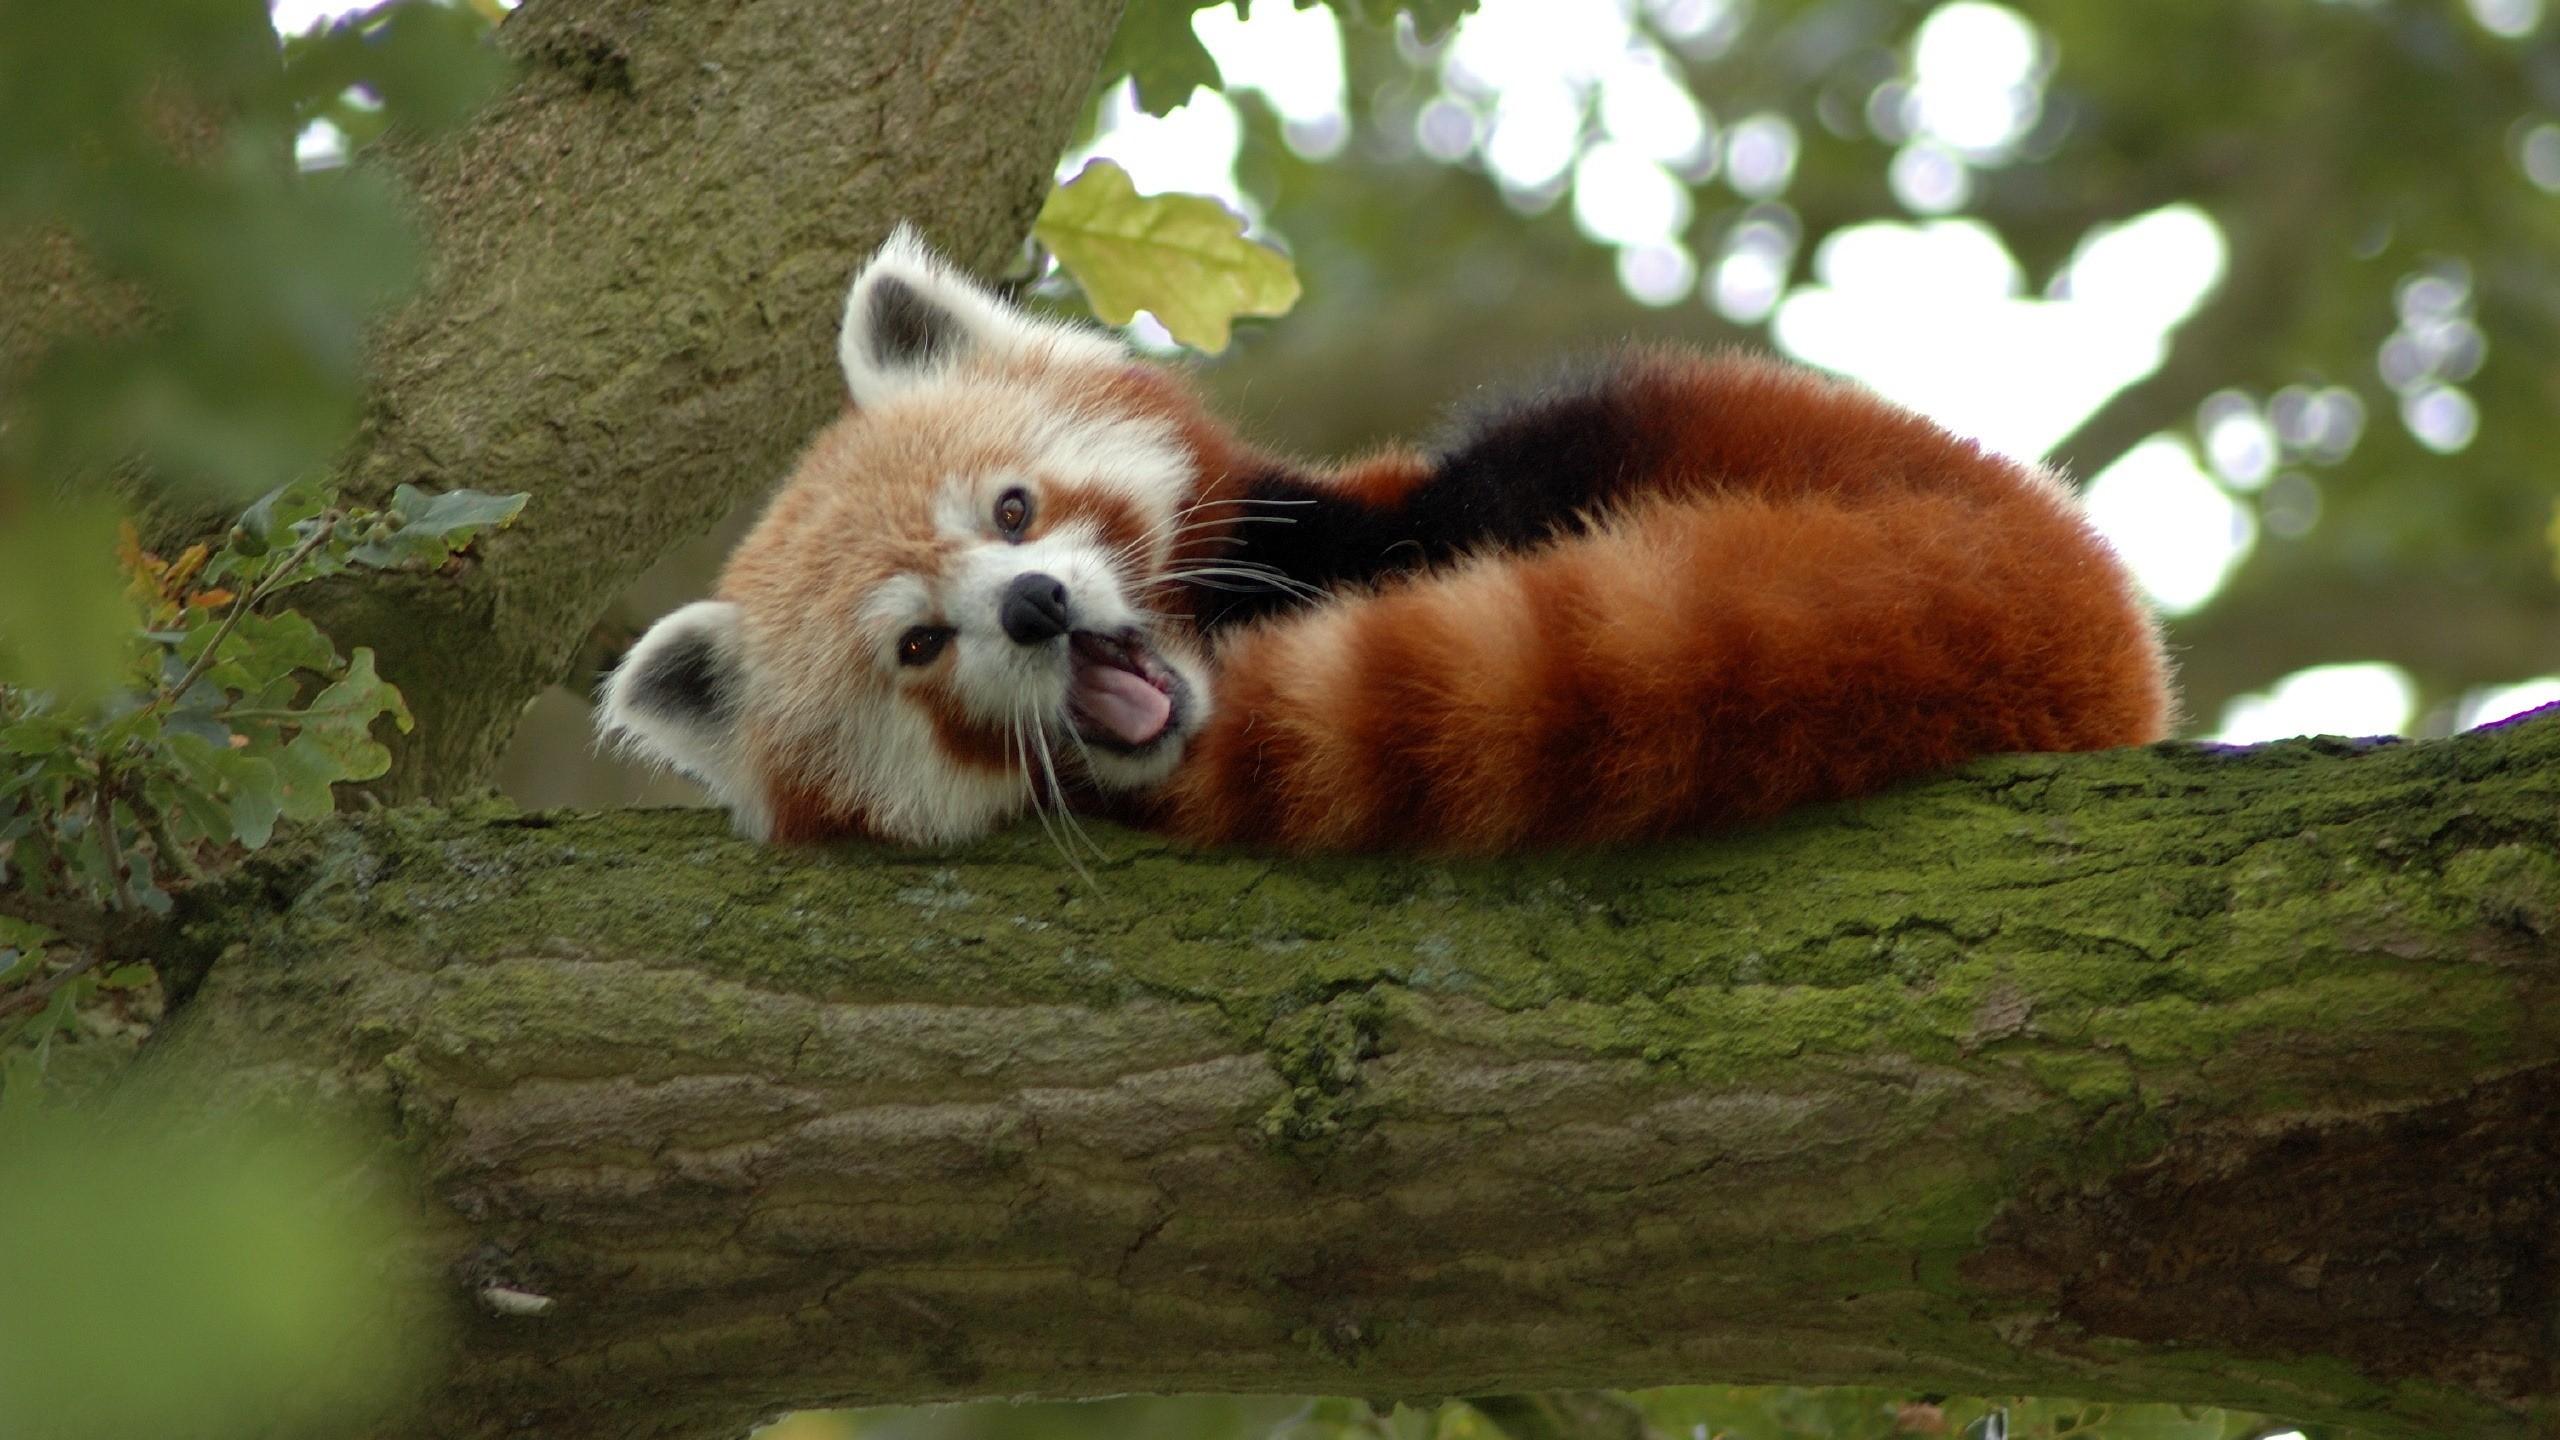 Red Panda  № 1564072 бесплатно